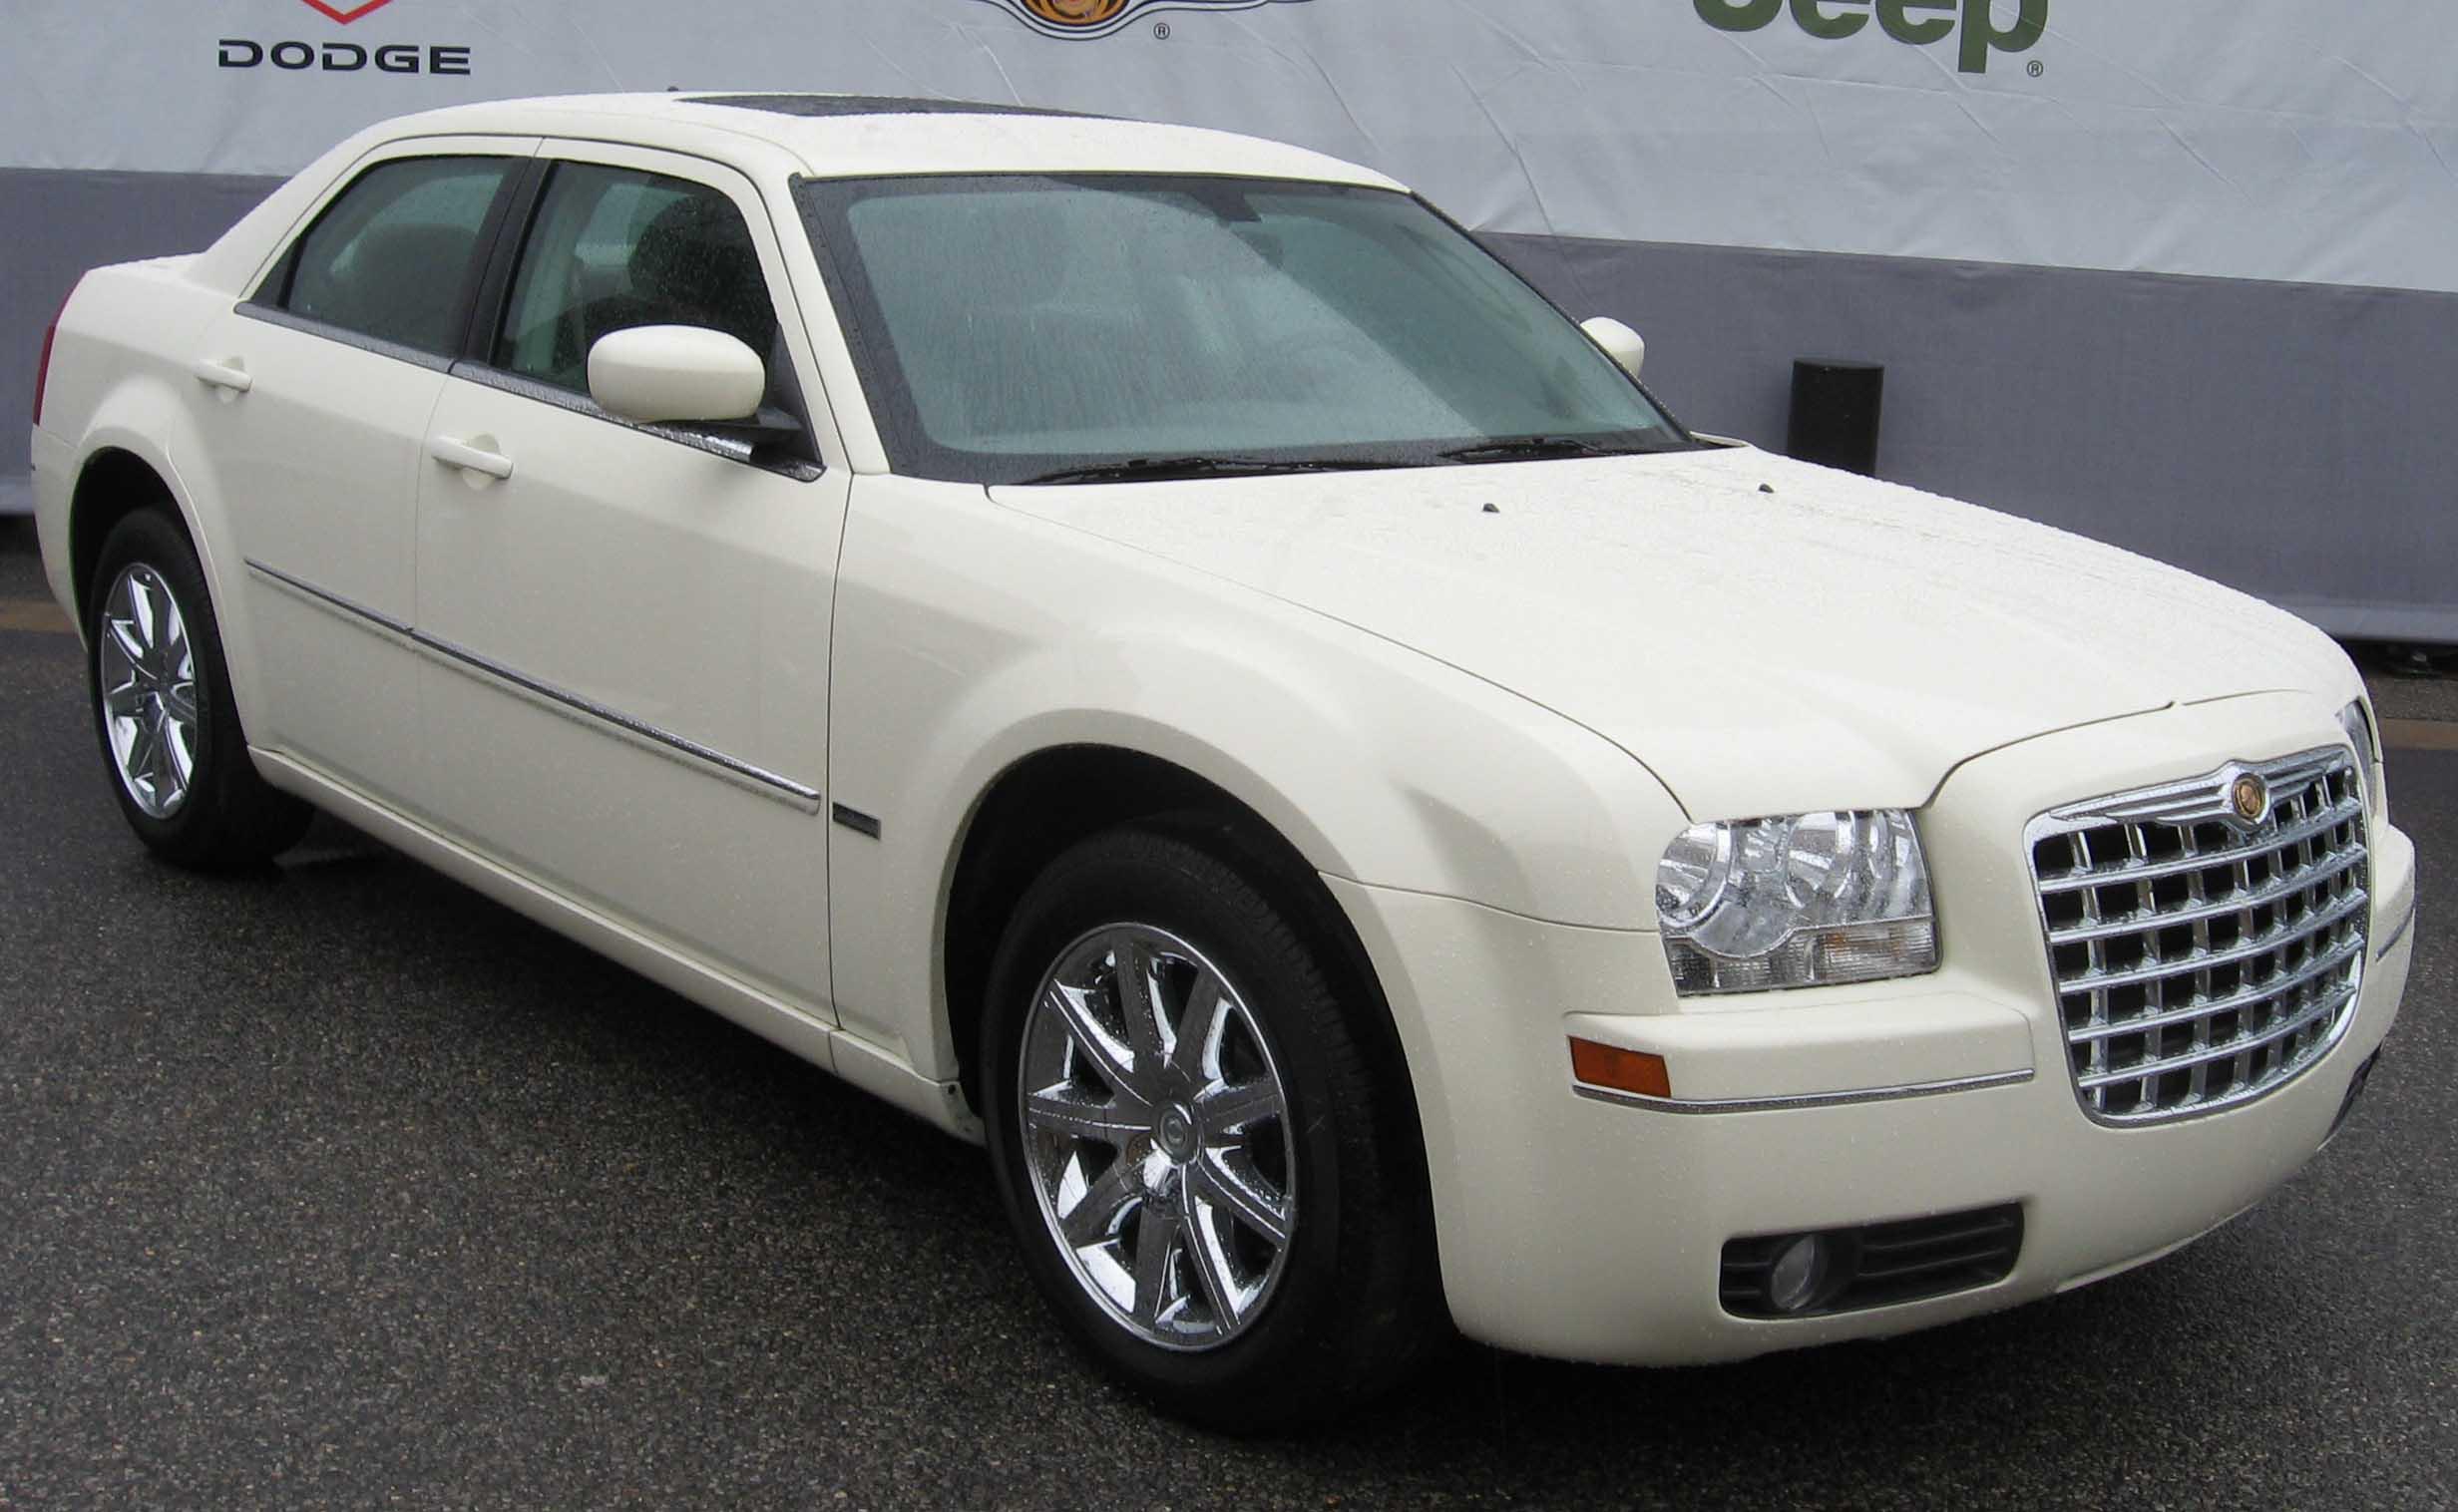 Chrysler 300 Wallpapers Hd